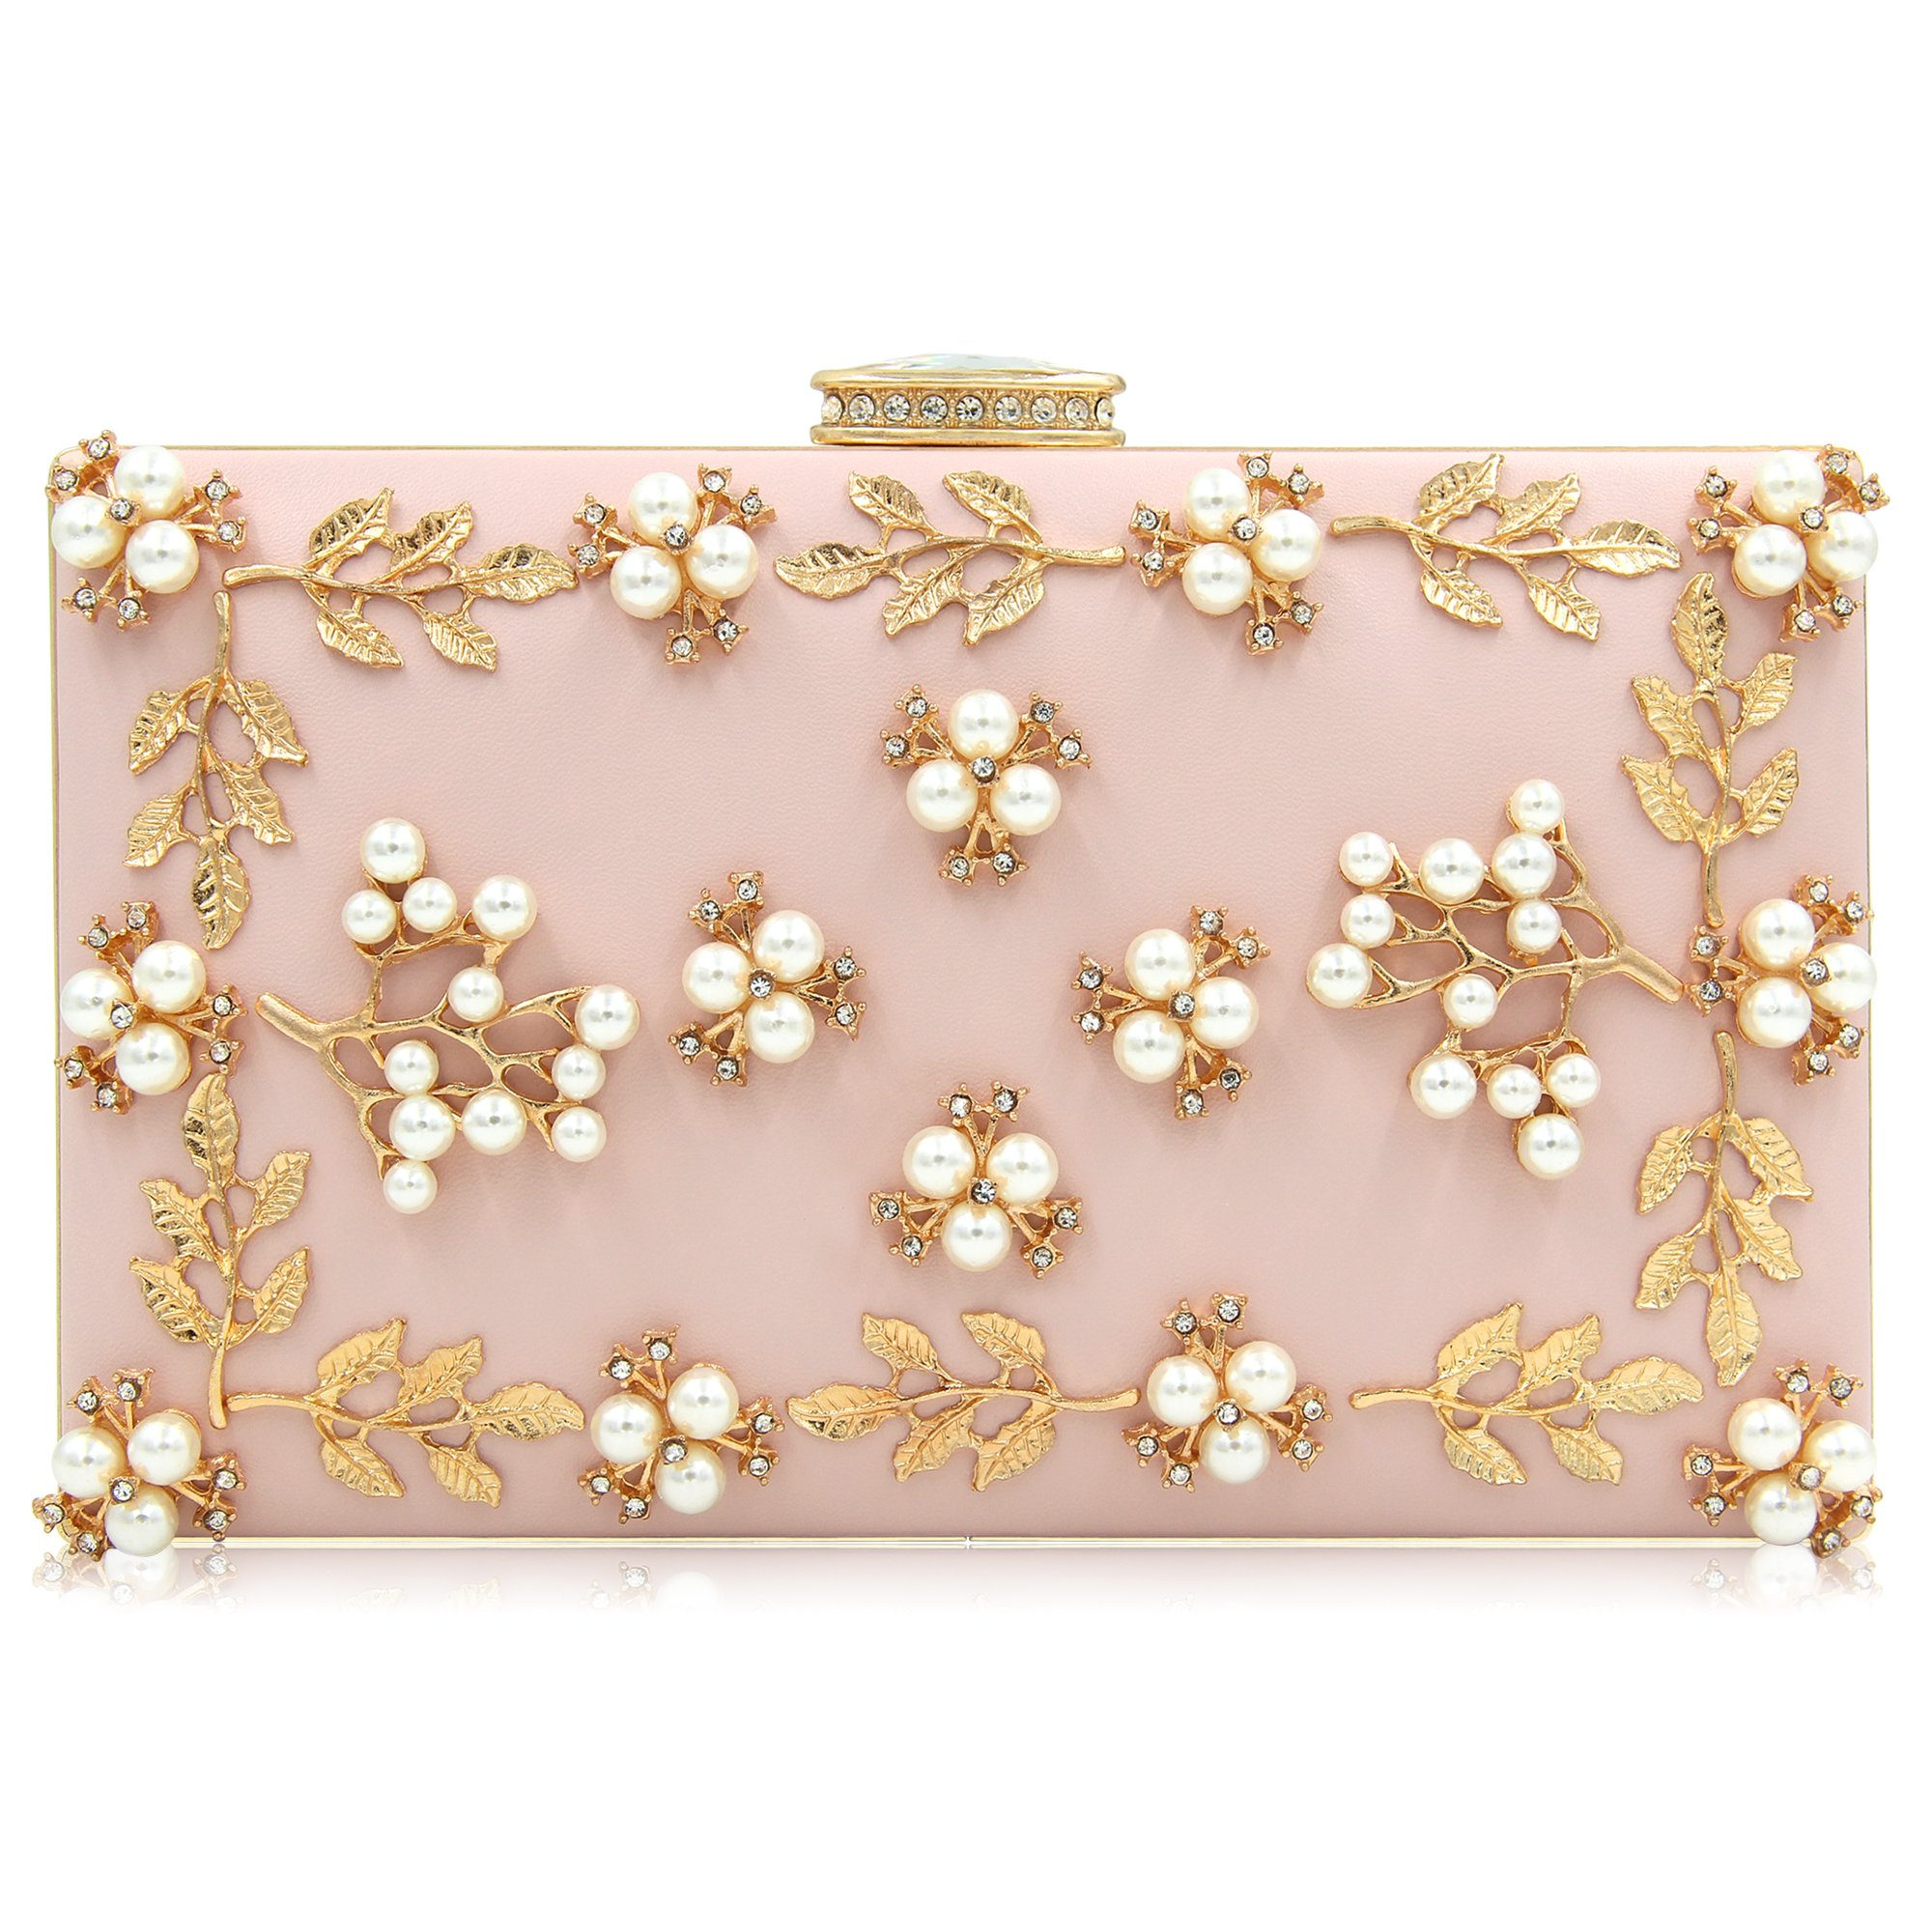 29cc21a4f6 Galleon - Milisente Women Clutches Pearls Evening Bag Clutch Purse Bags  (Light Pink)